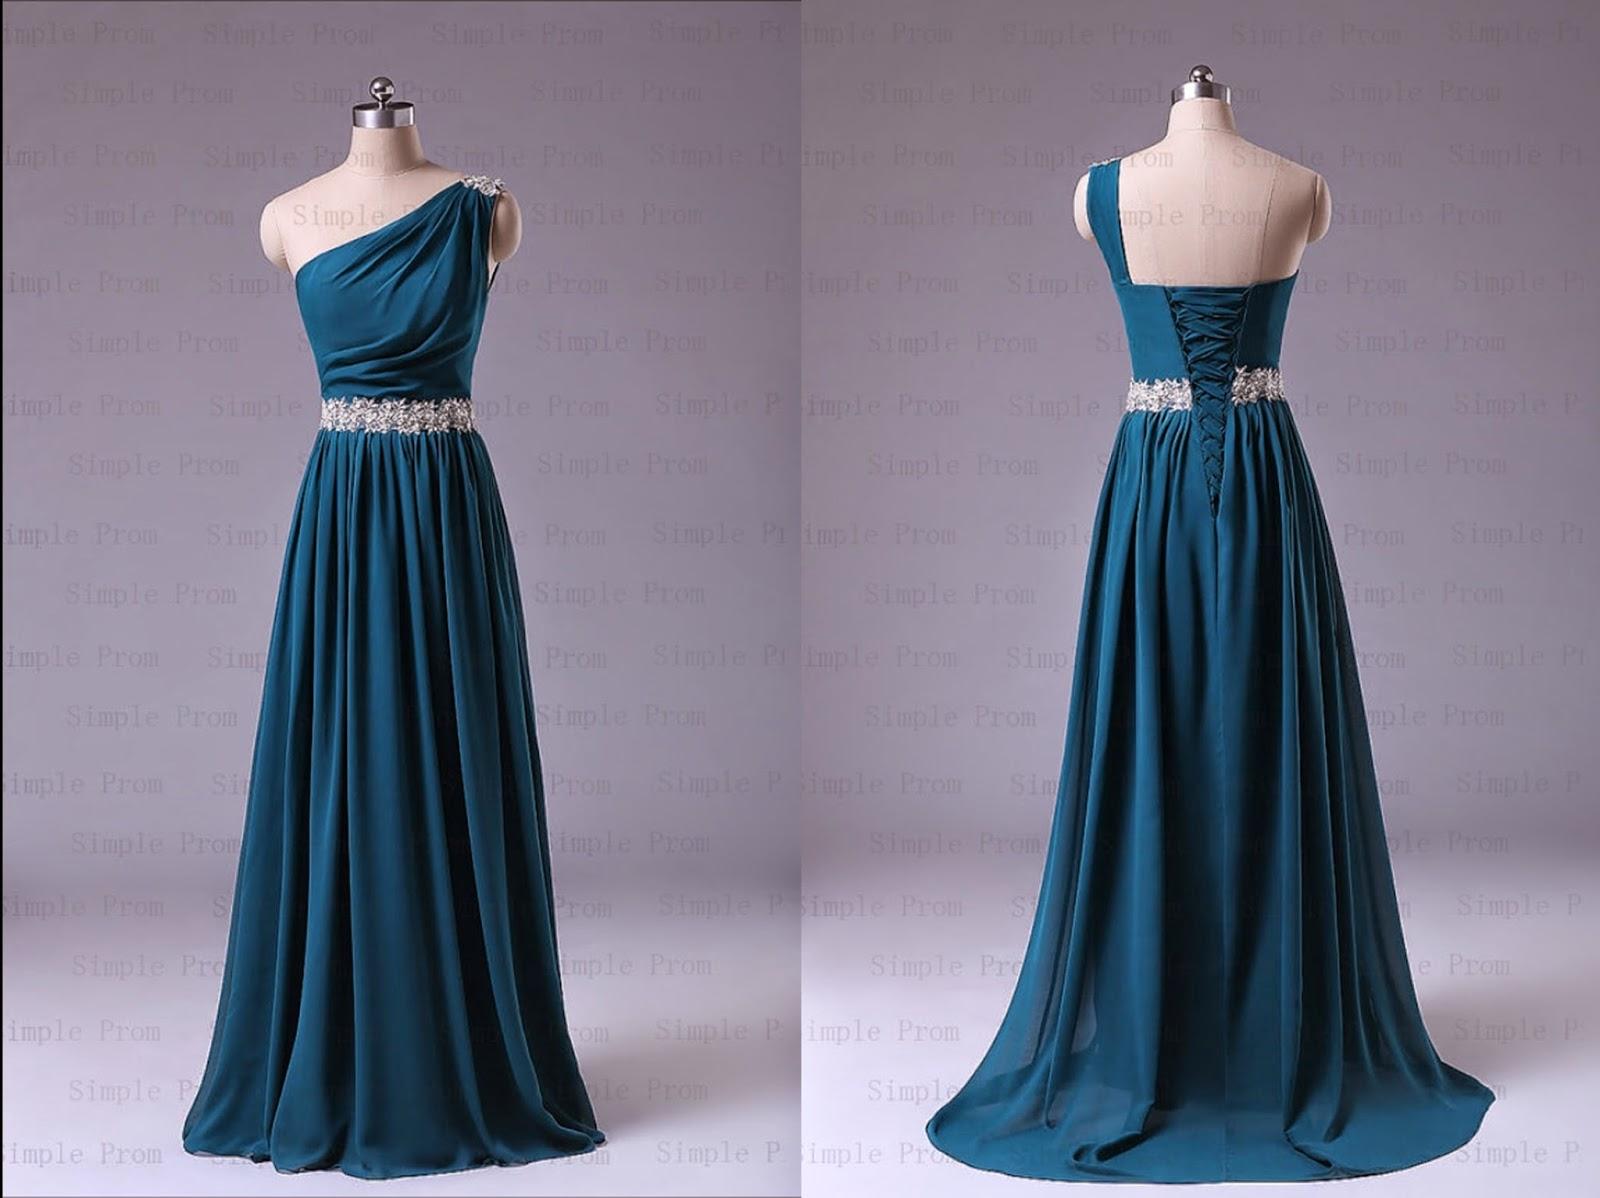 Renting Local Prom Dresses Michigan 63